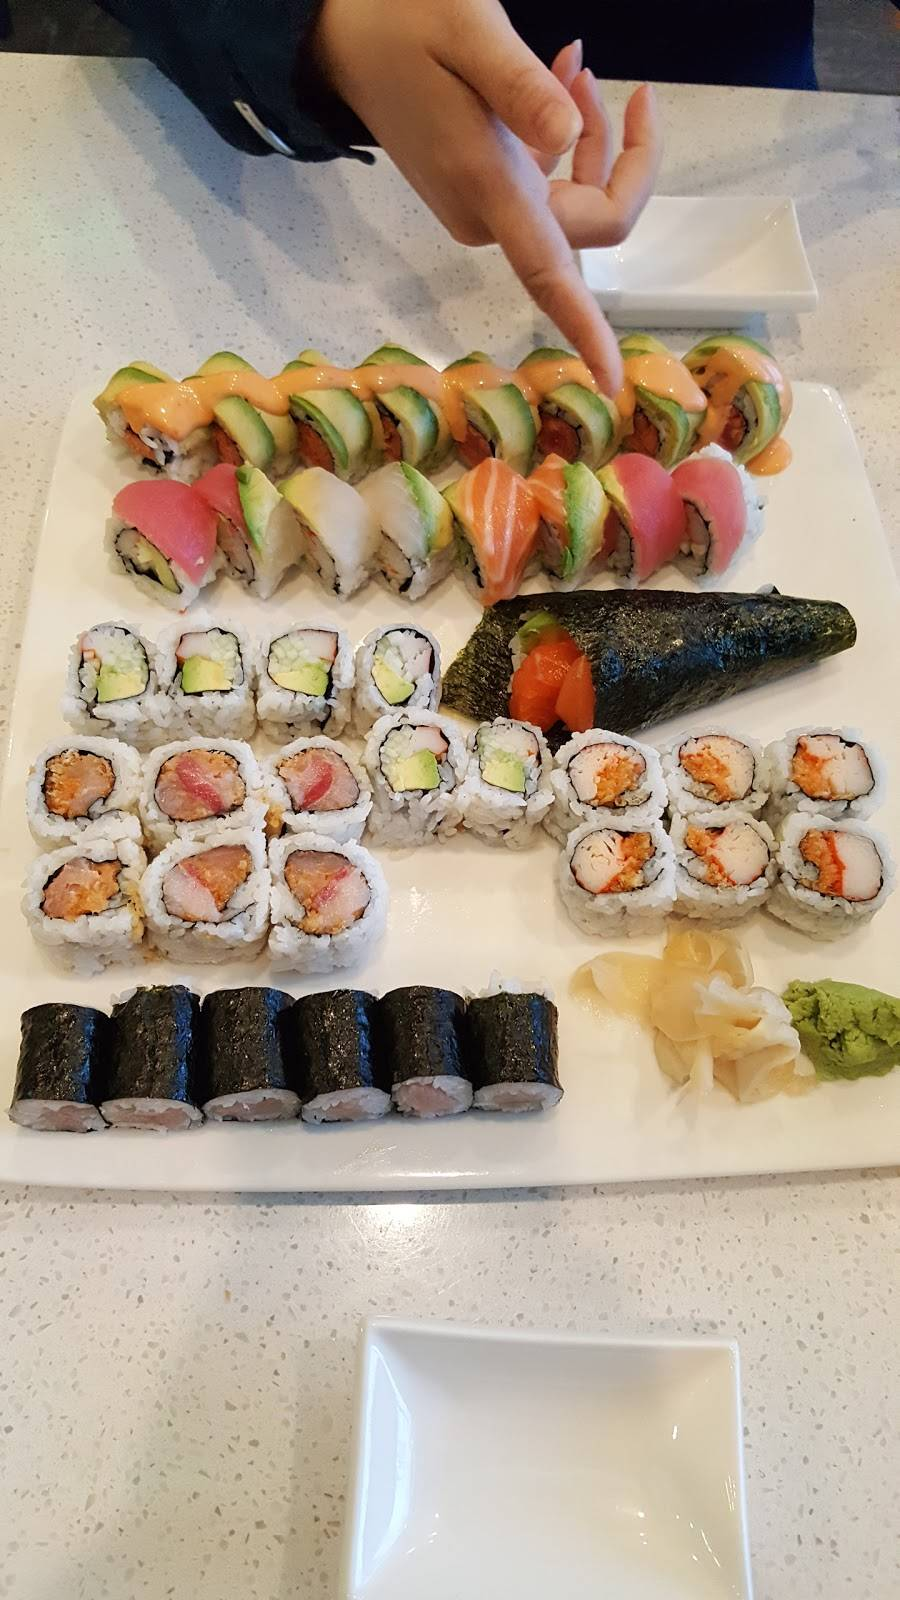 Kai Fan | restaurant | 3717 Riverdale Ave, Bronx, NY 10463, USA | 3472758056 OR +1 347-275-8056